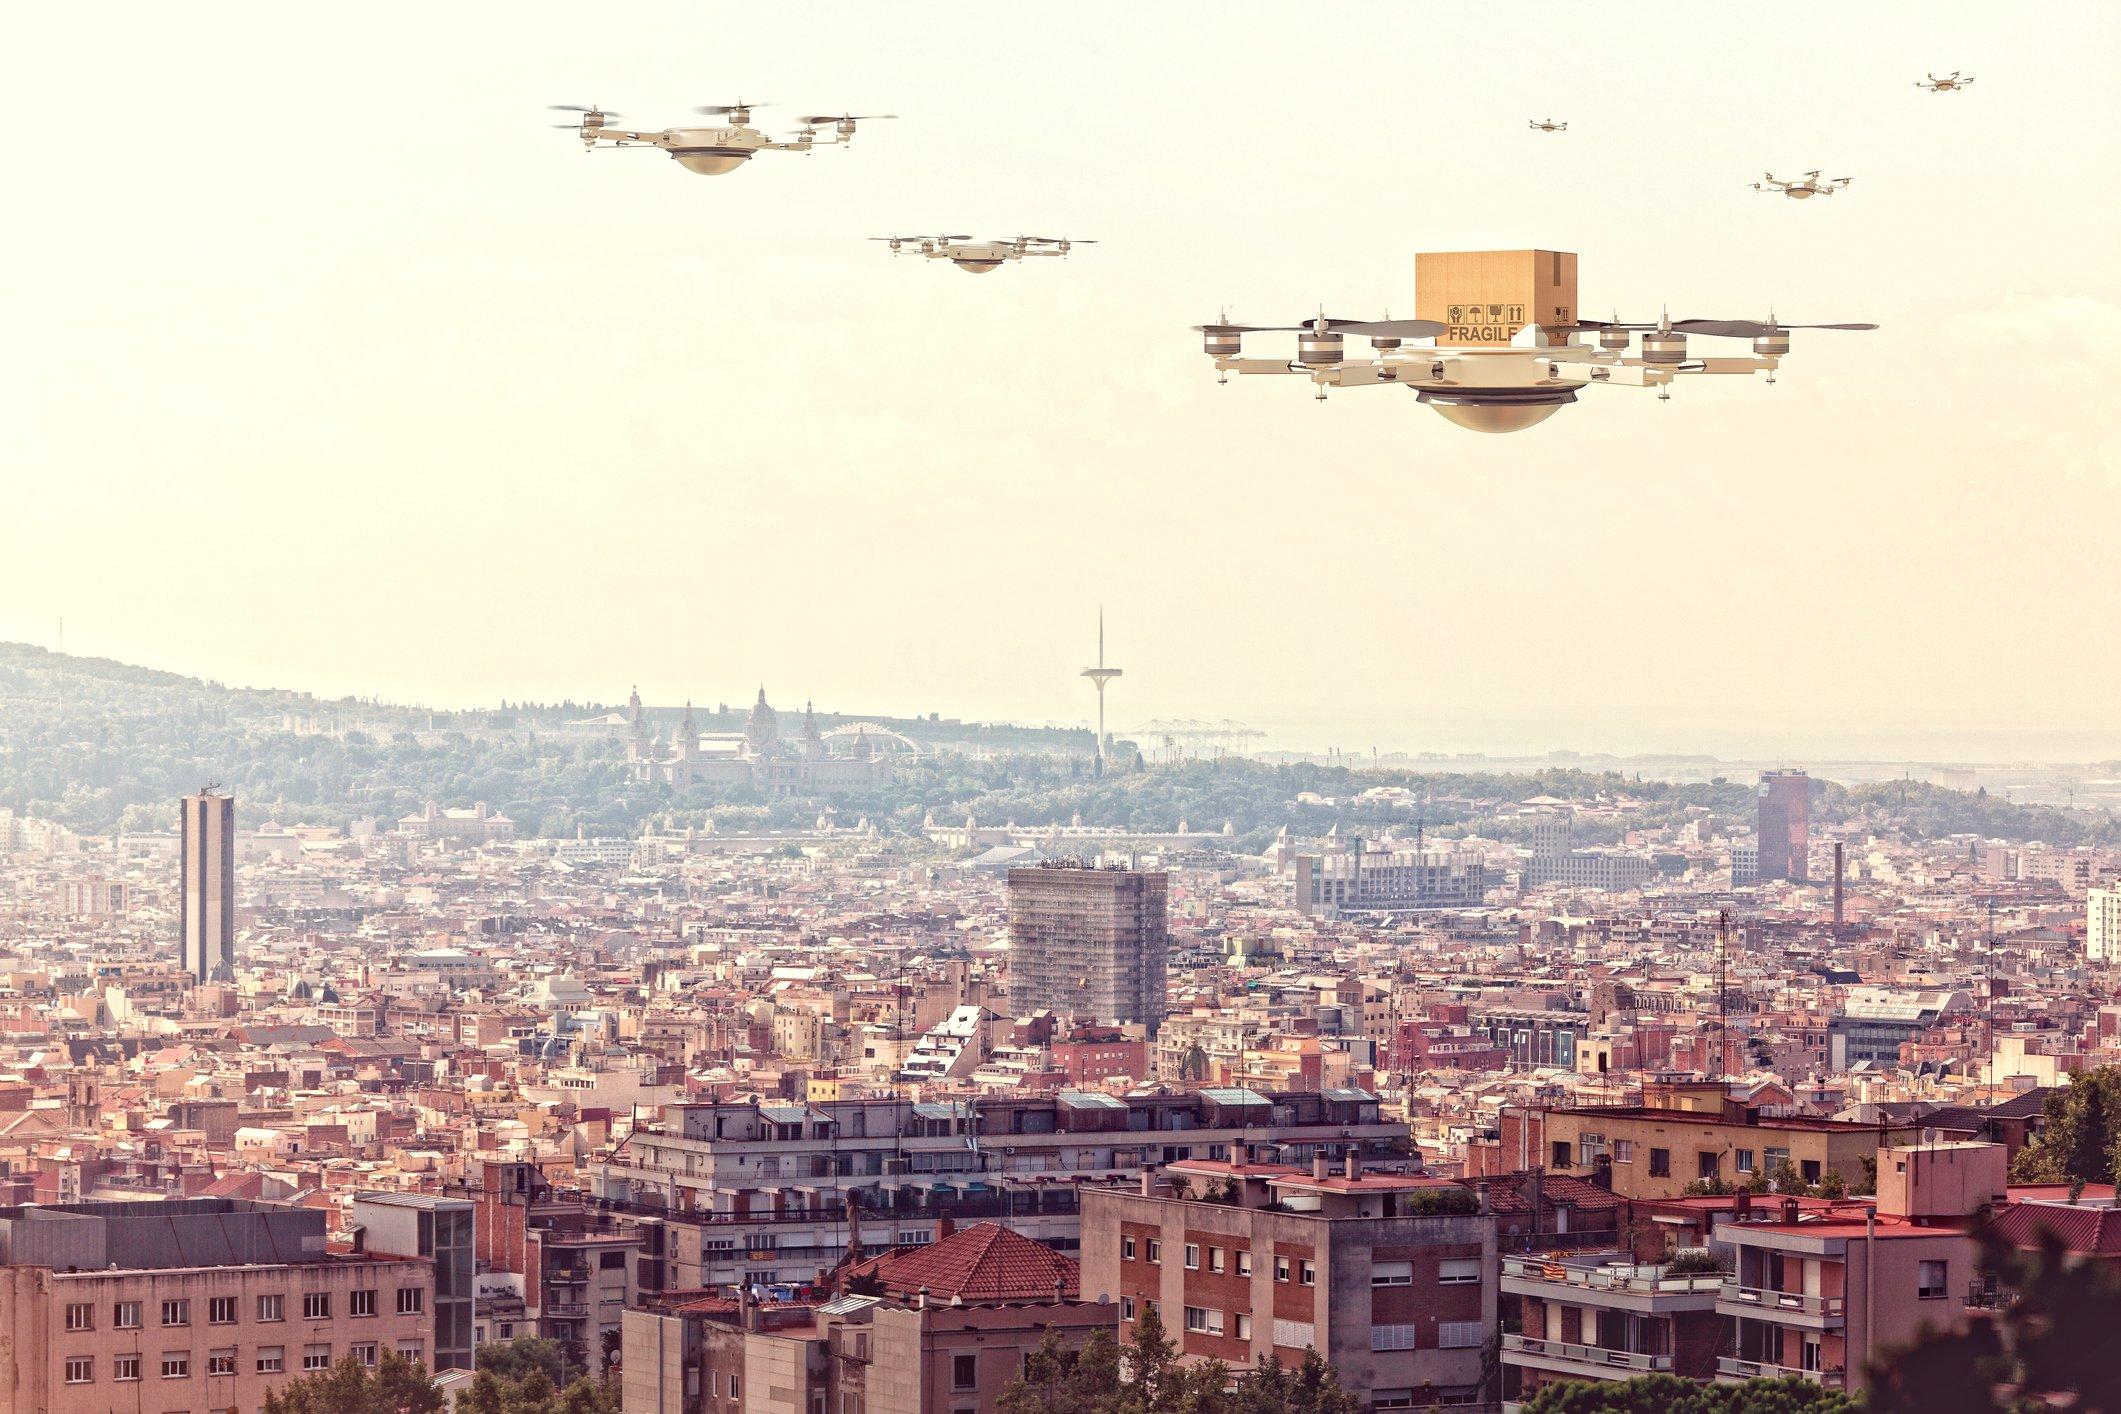 Drone delivery economics: are Amazon drones economically worth it?